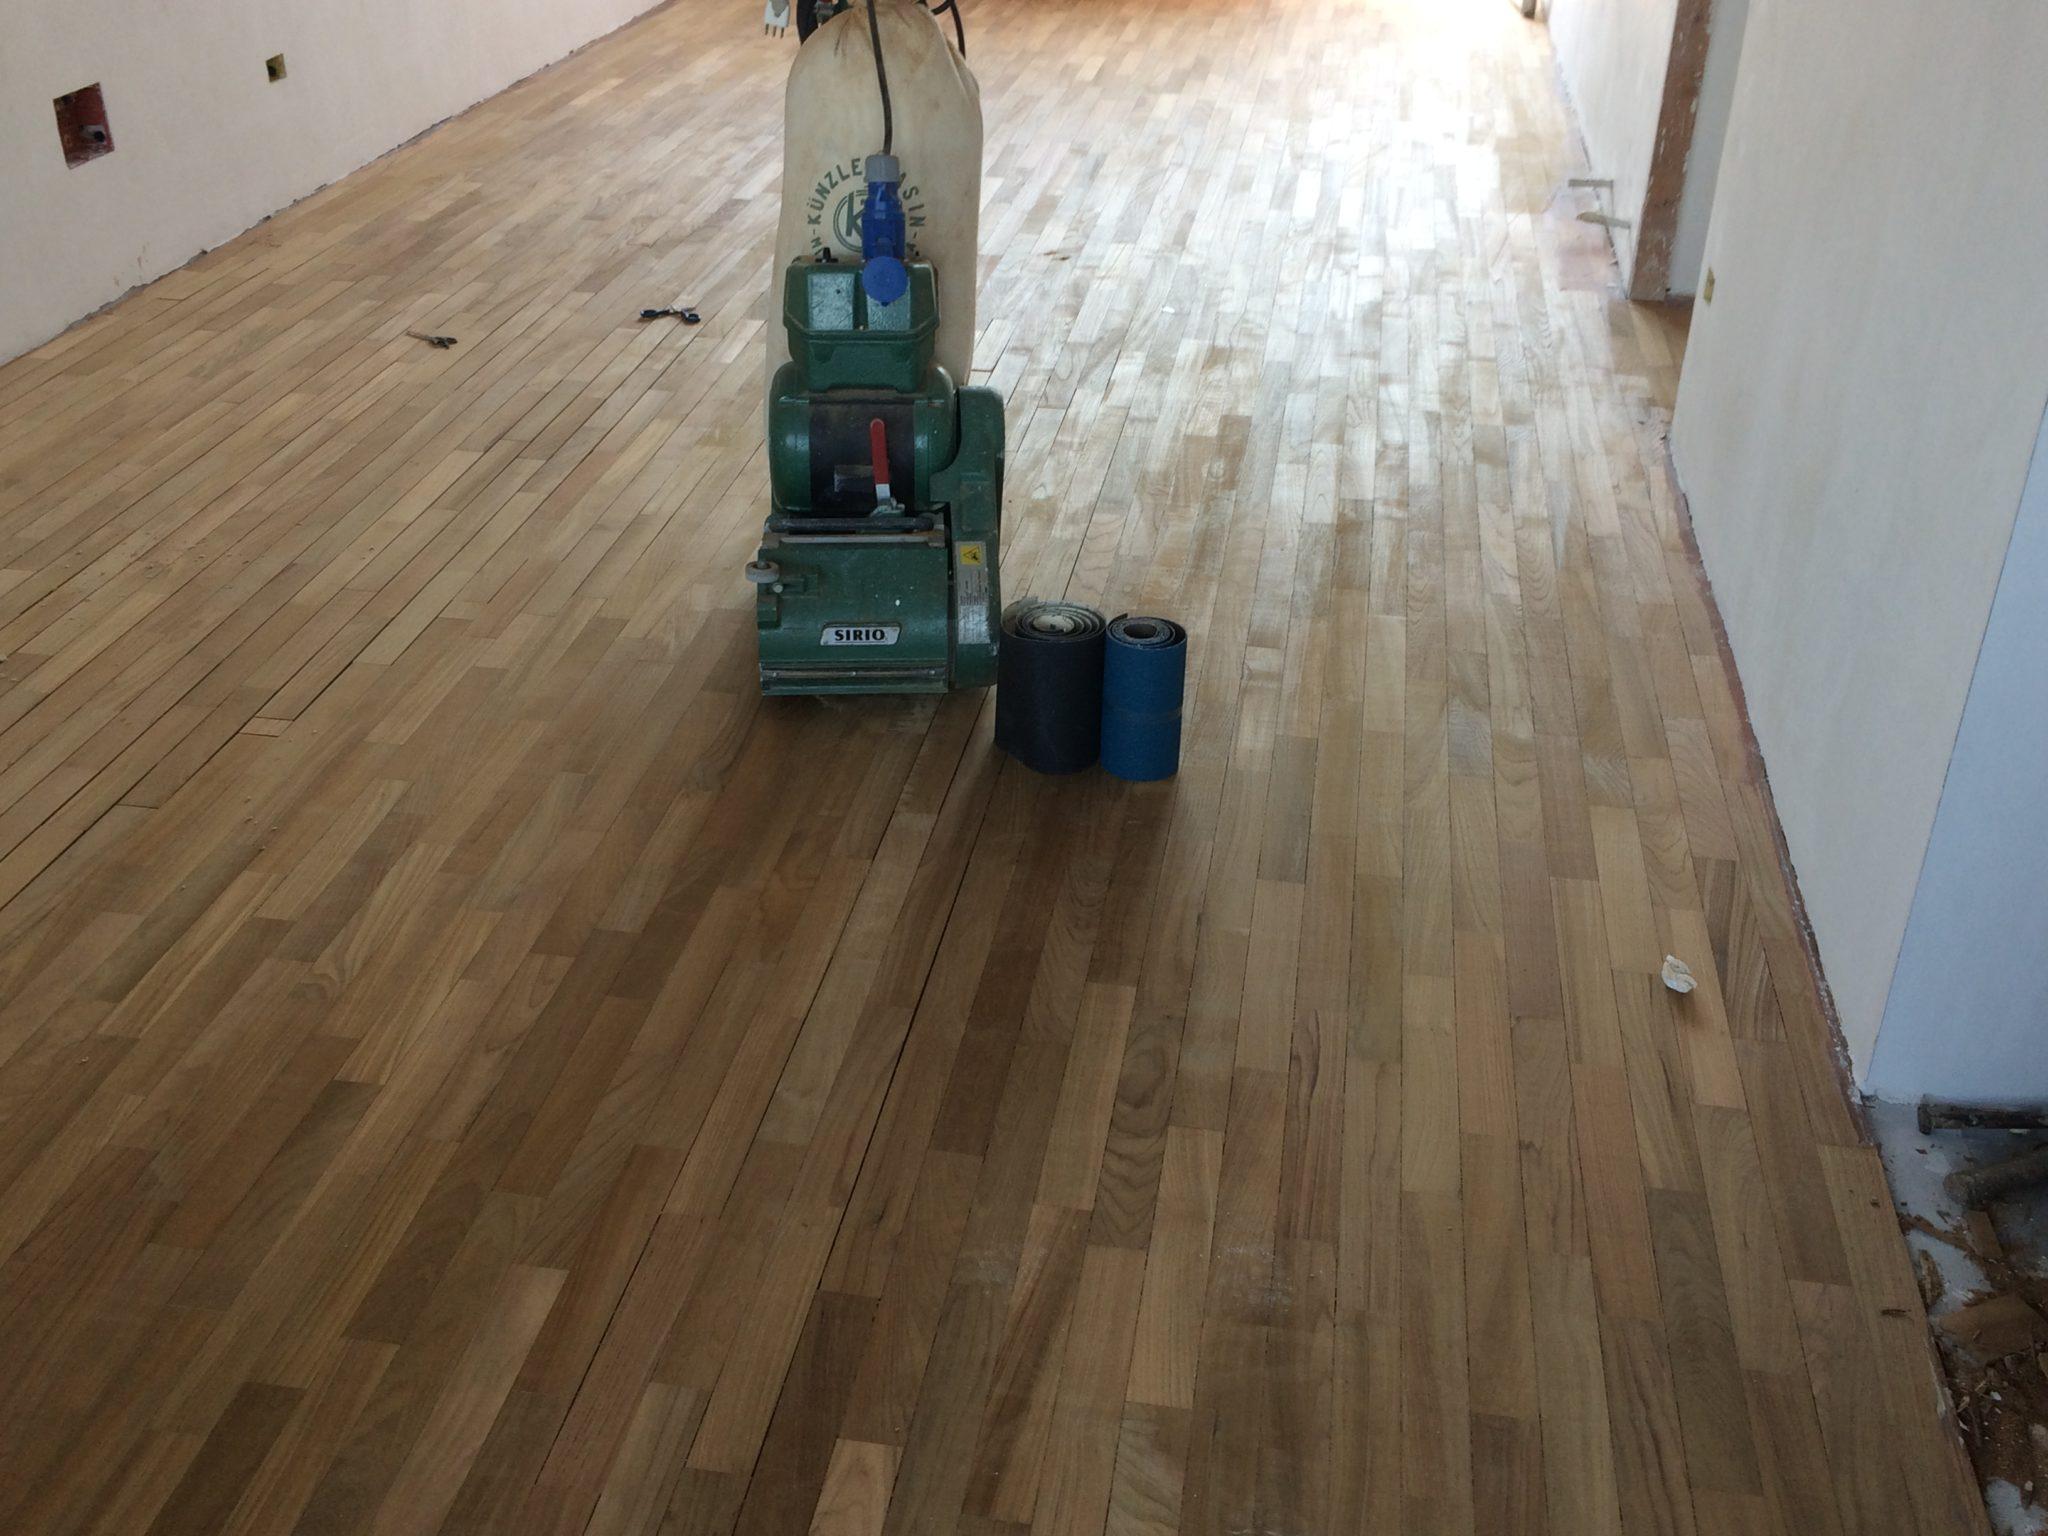 Great pavimenti accessori per pavimenti ikea levigatura - Parquet flottante ikea ...